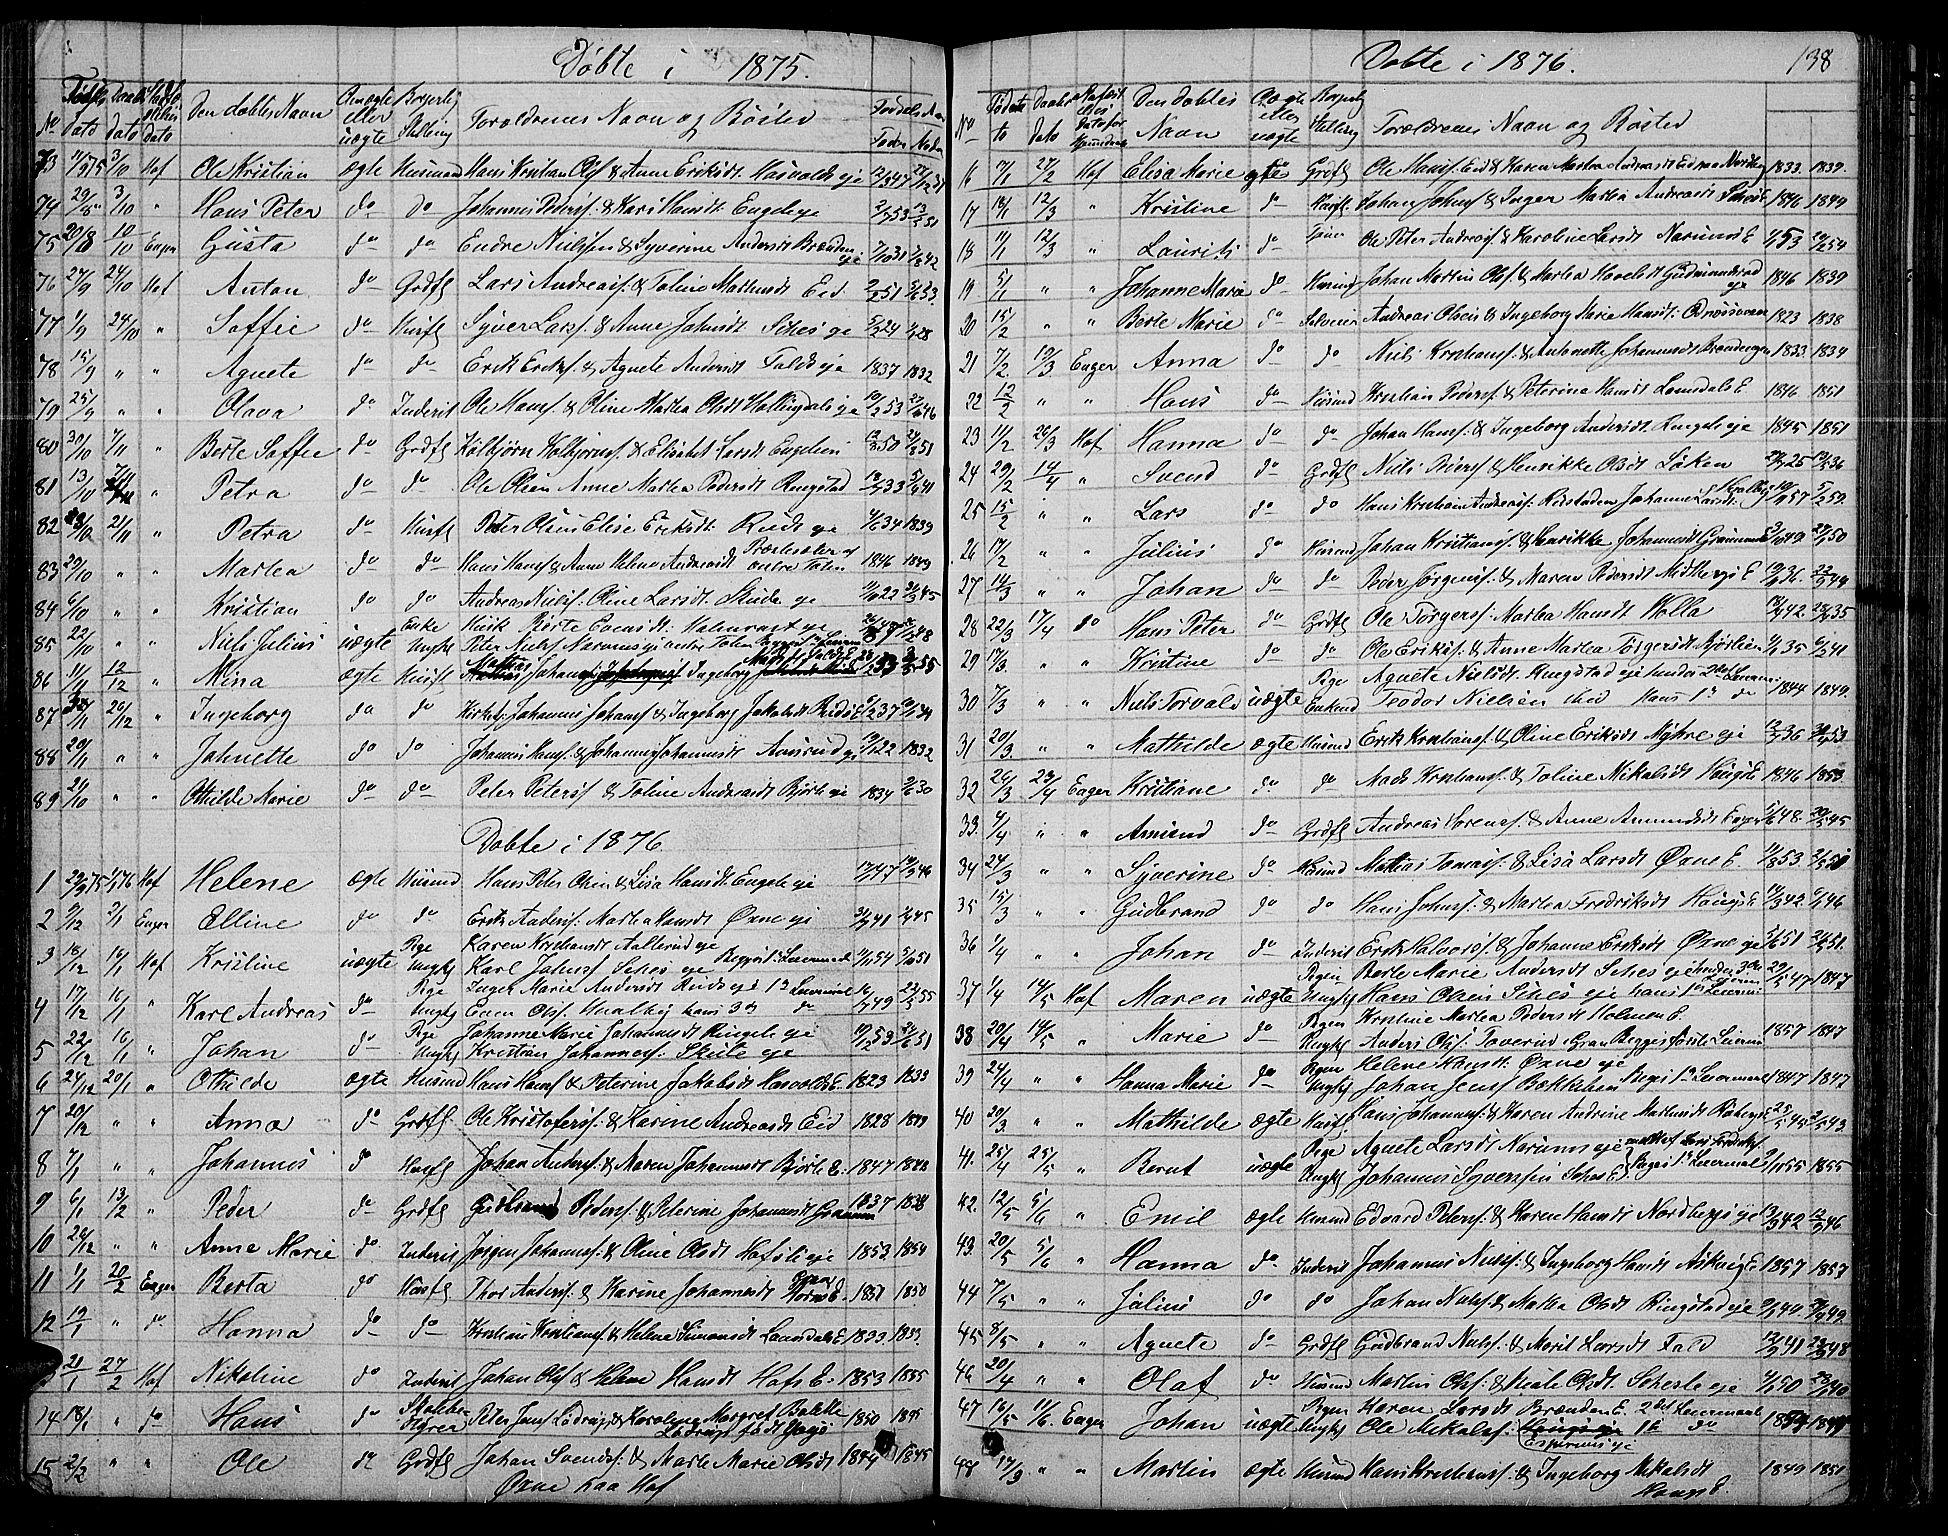 SAH, Søndre Land prestekontor, L/L0001: Klokkerbok nr. 1, 1849-1883, s. 138